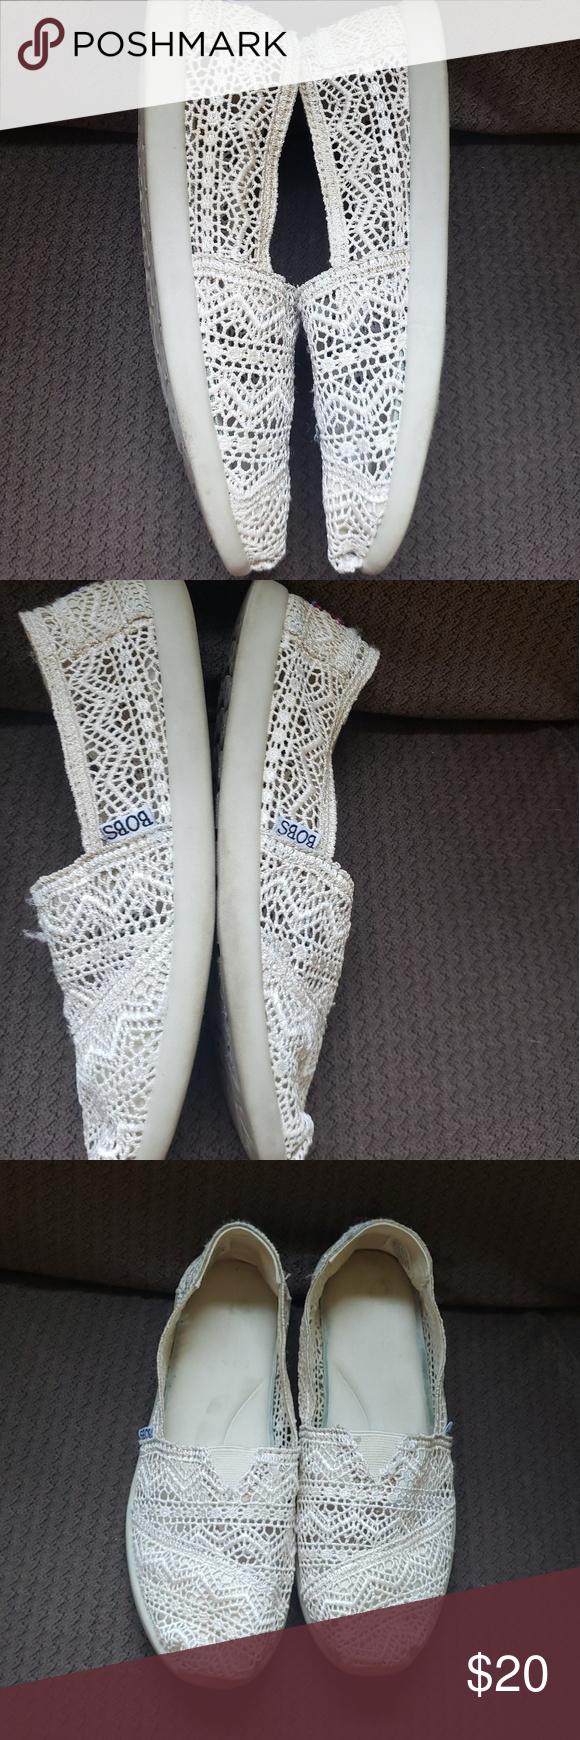 BOBS lace shoes in 2020 | Shoe laces